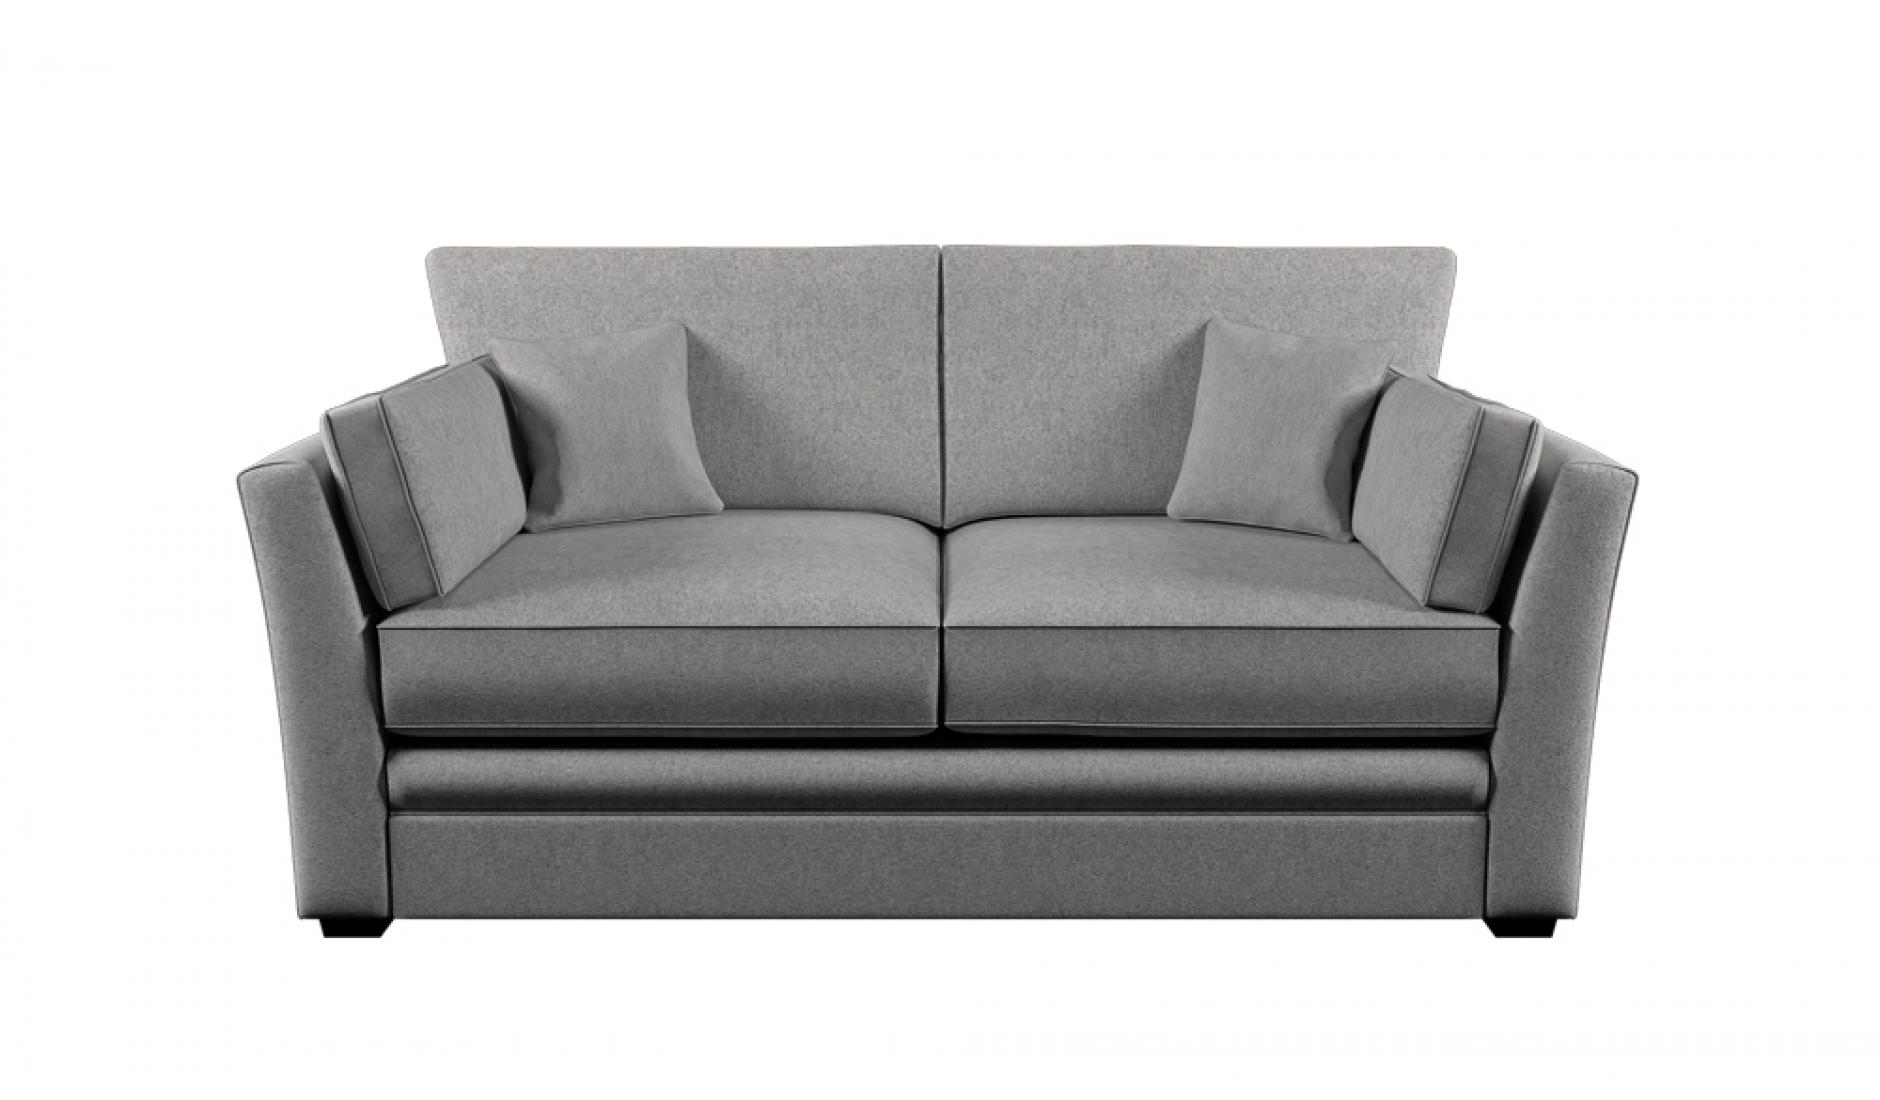 Charlie seater sofa sleek and comfy the charlie seater sofa